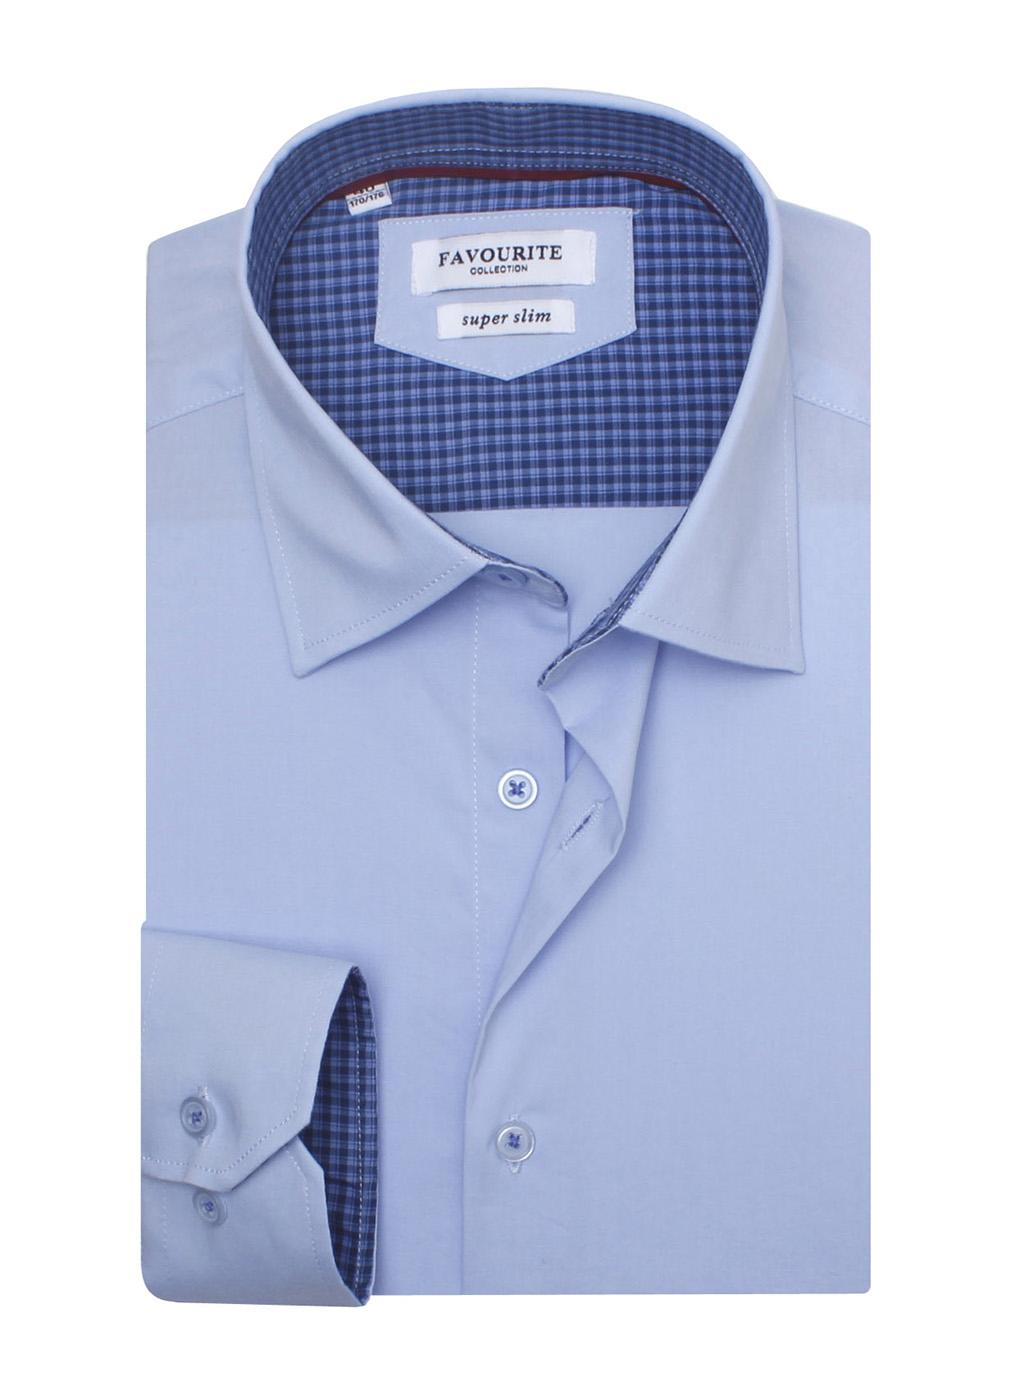 Рубашка мужская 20, Favourite фото